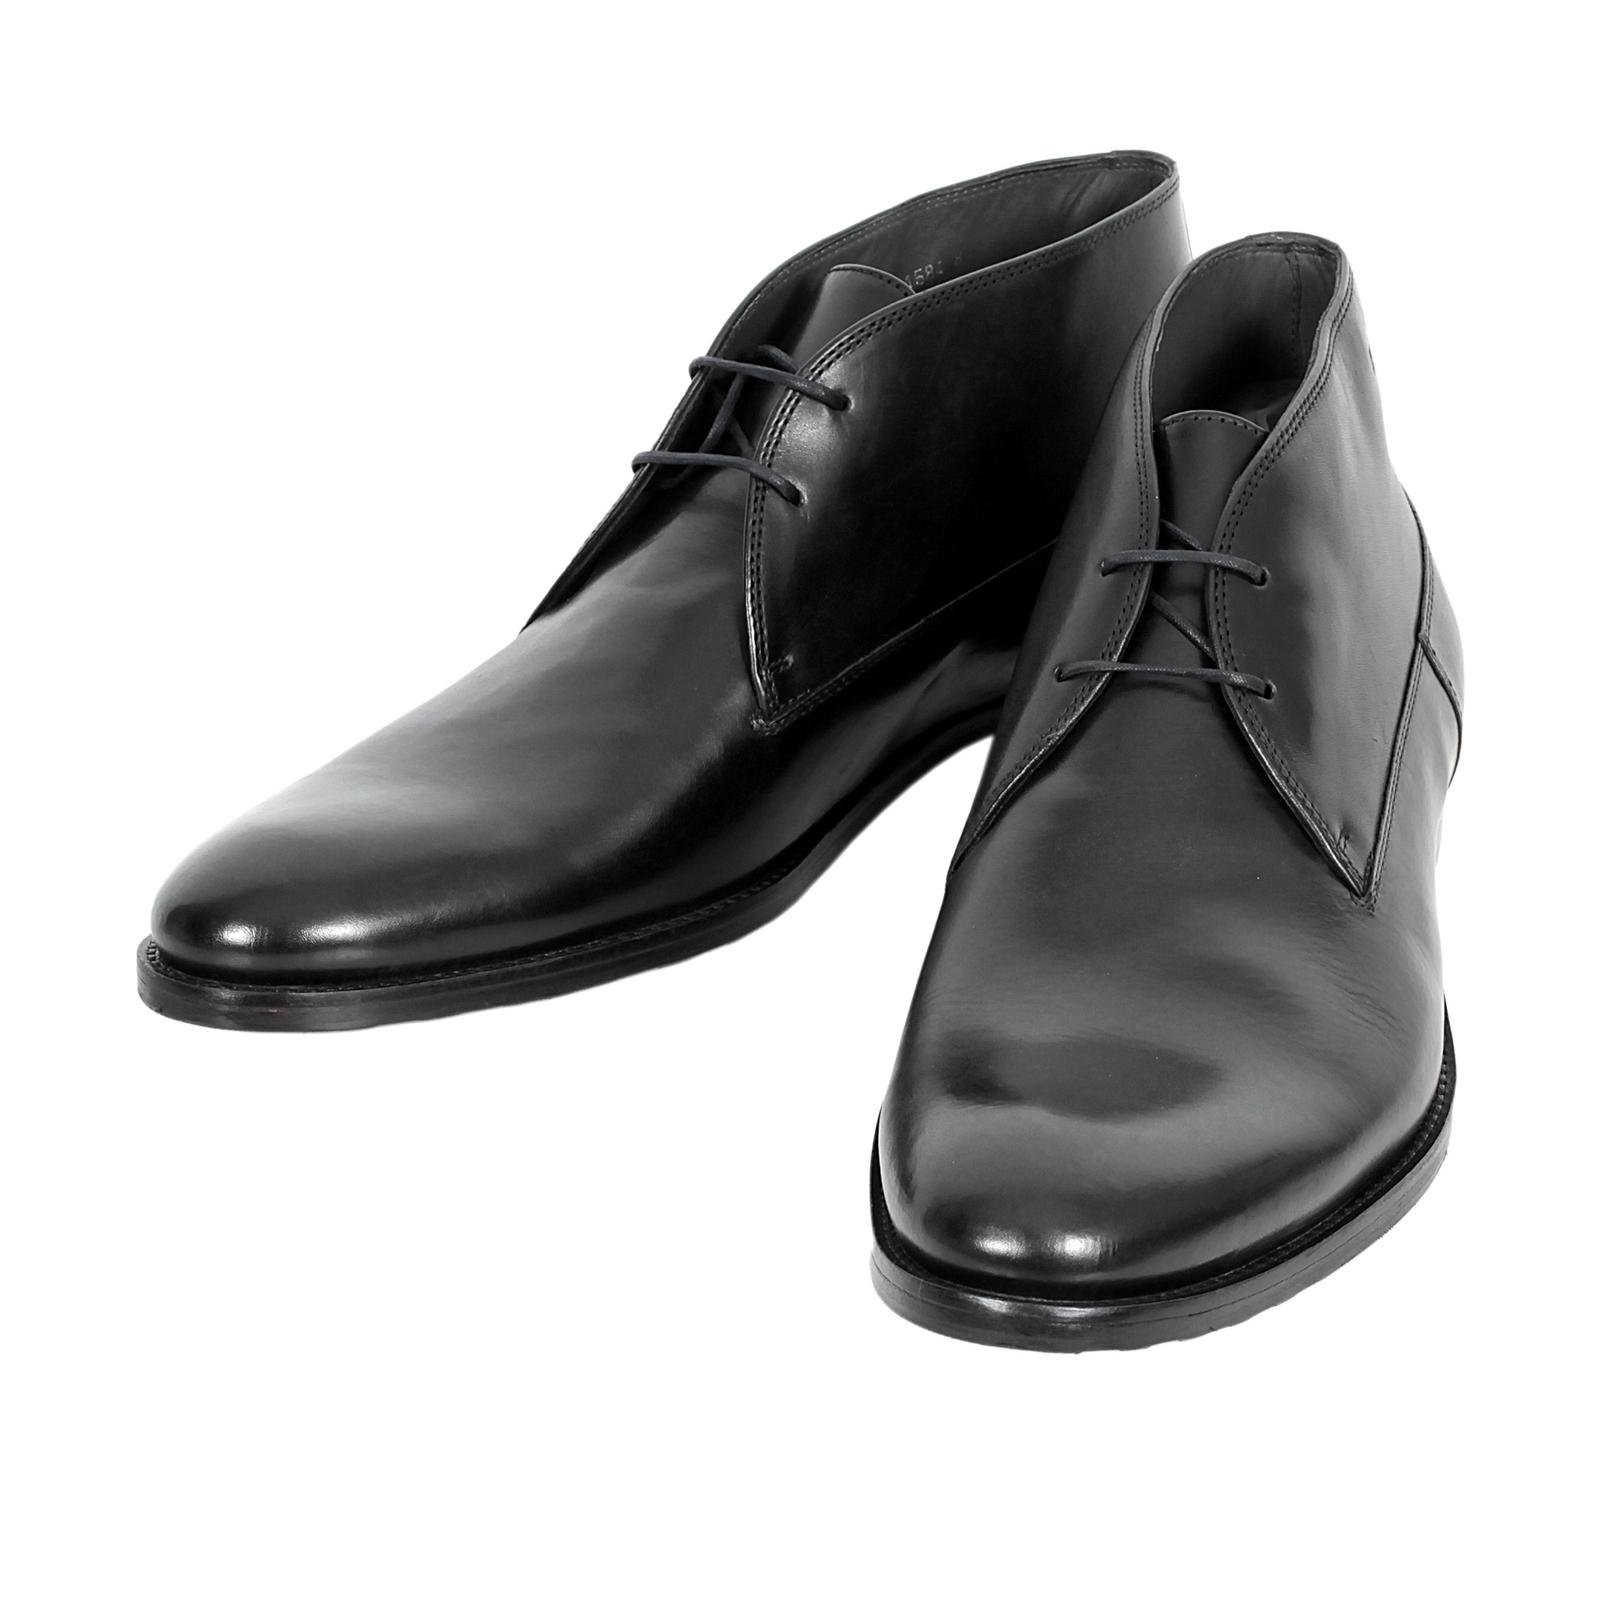 Shoes Hugo Boss Price